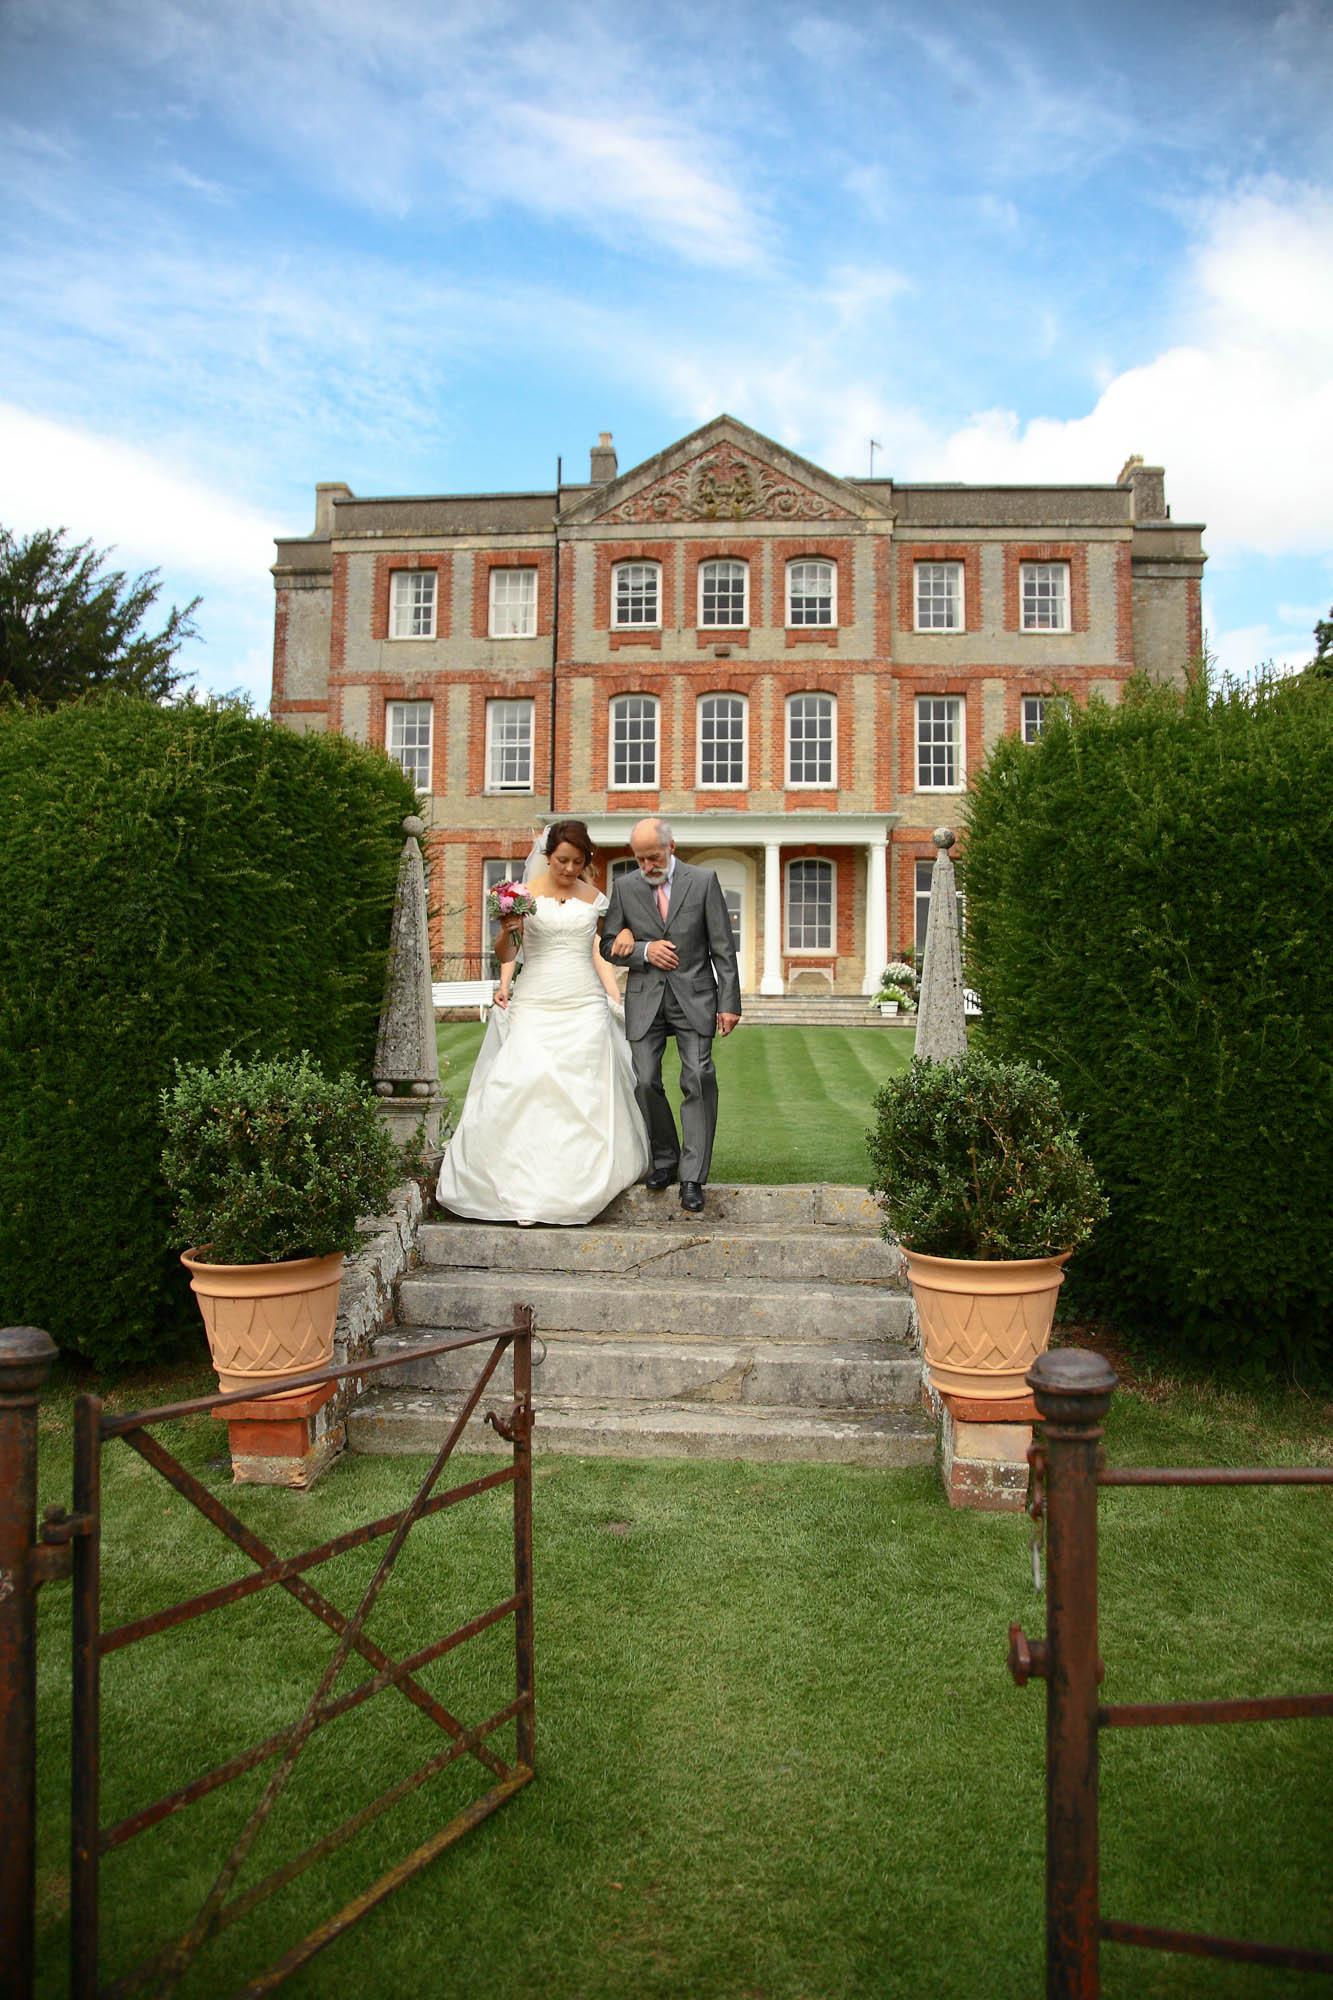 weddings-couples-love-photographer-oxford-london-jonathan-self-photography-18.jpg